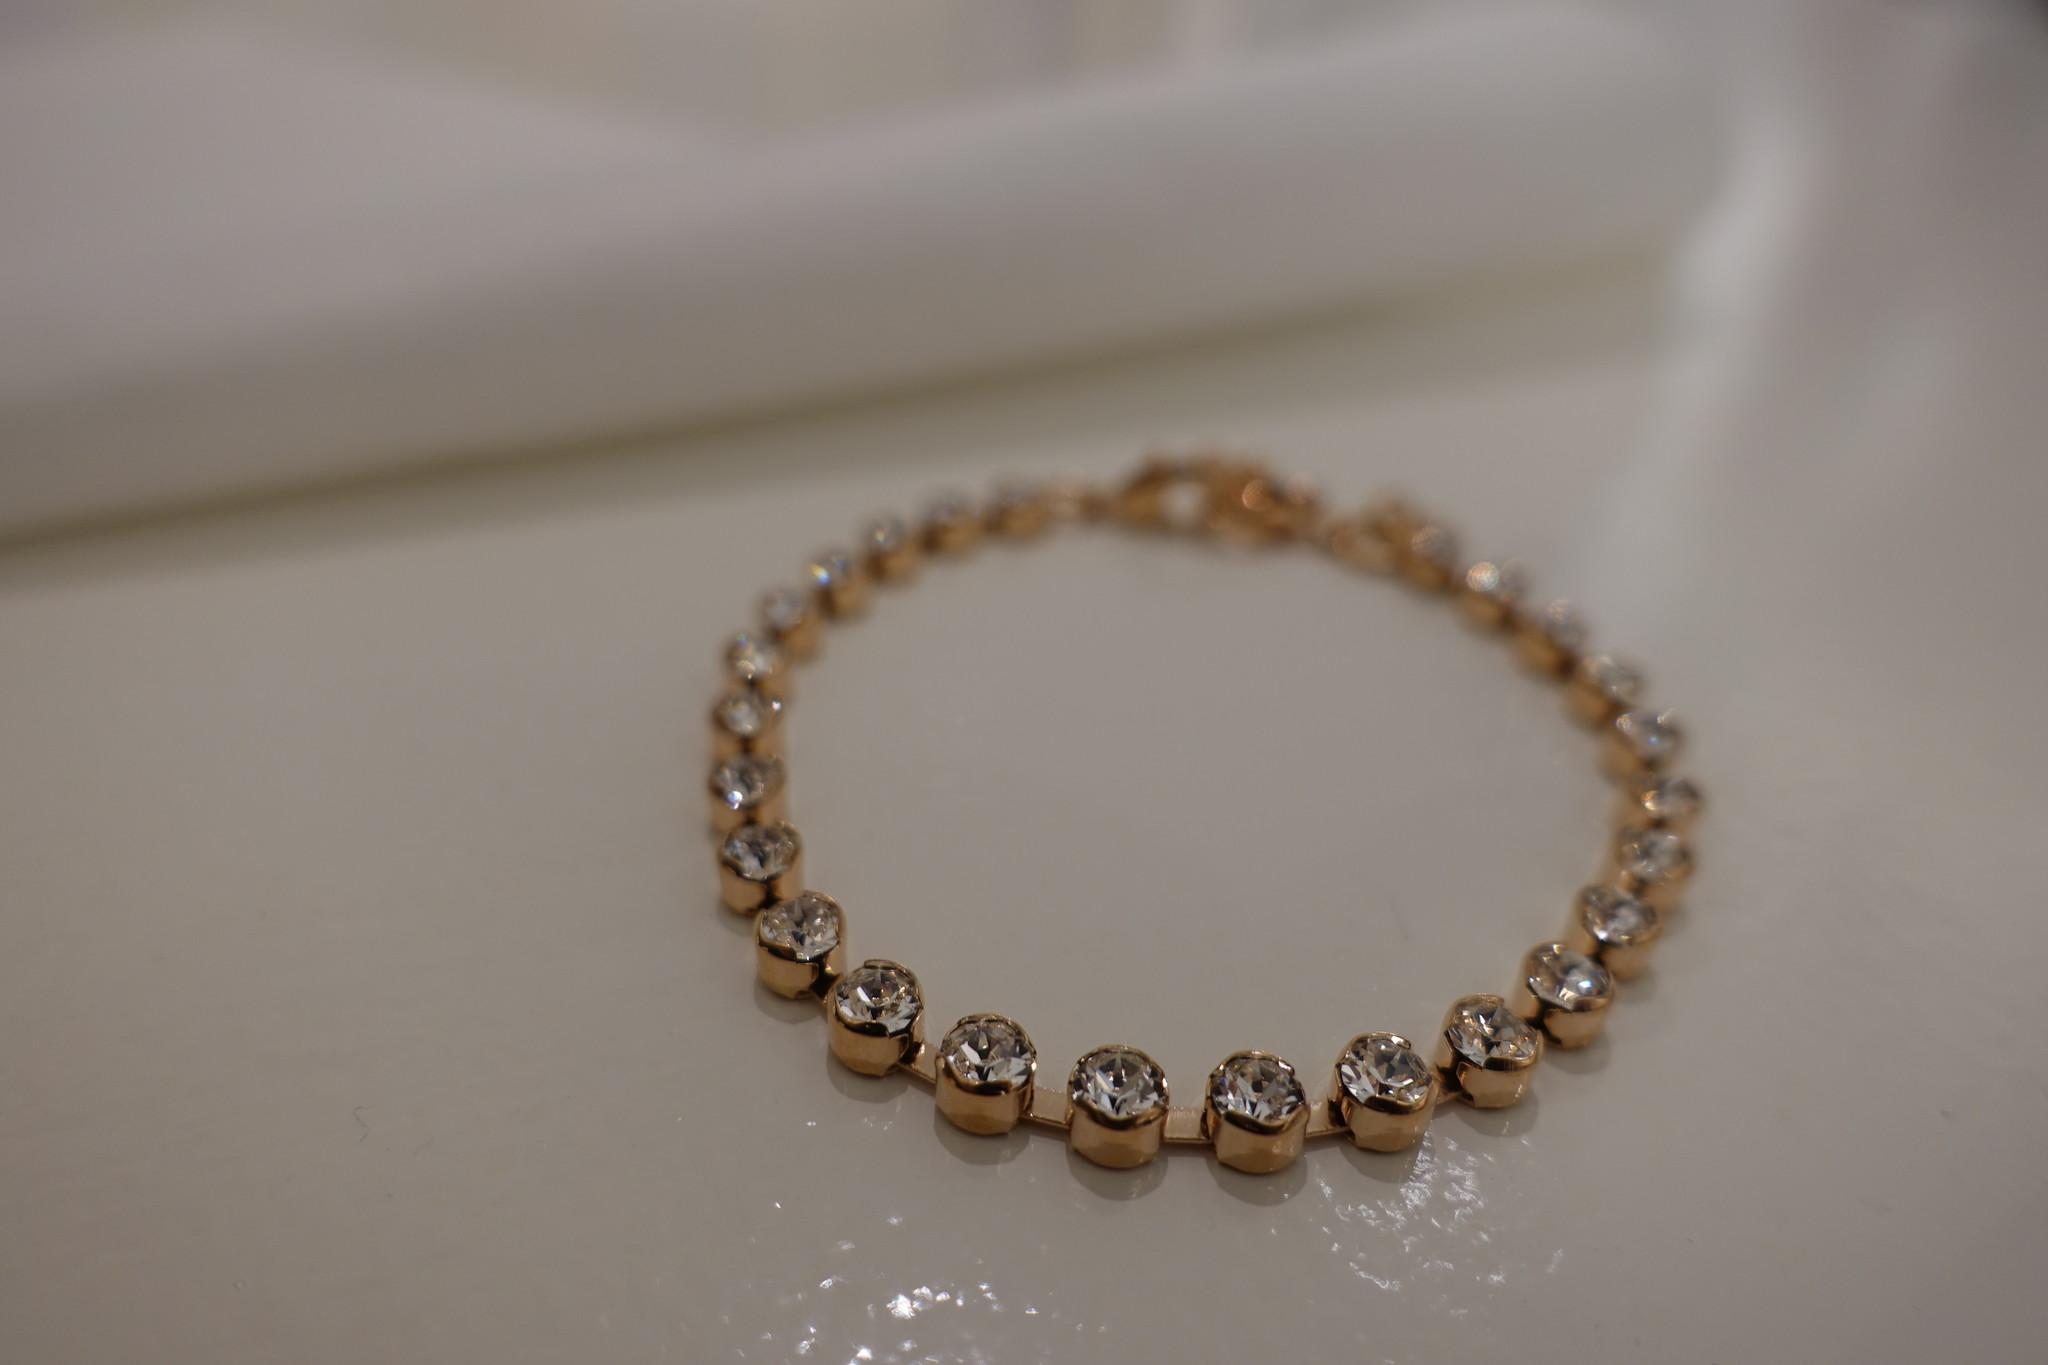 Rose armband met diamantjes, enkel-1